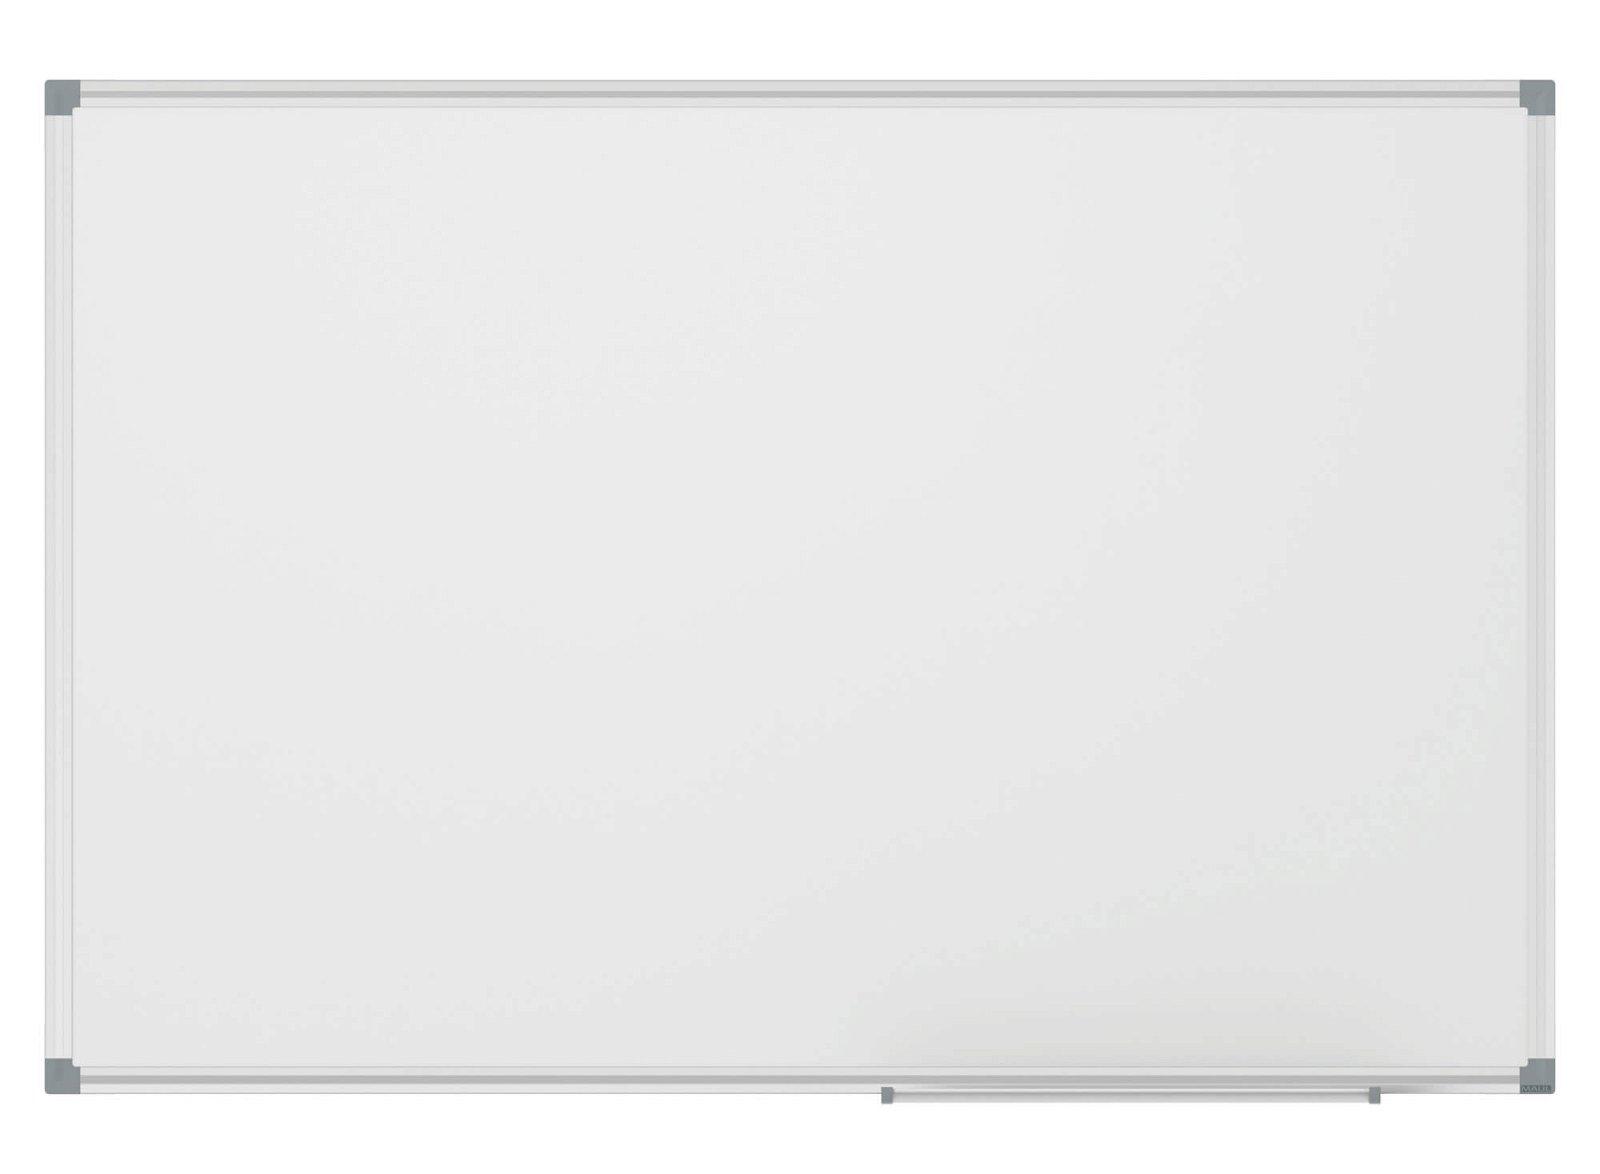 Whiteboard MAULstandard, Emaille, 90x120 cm, grau